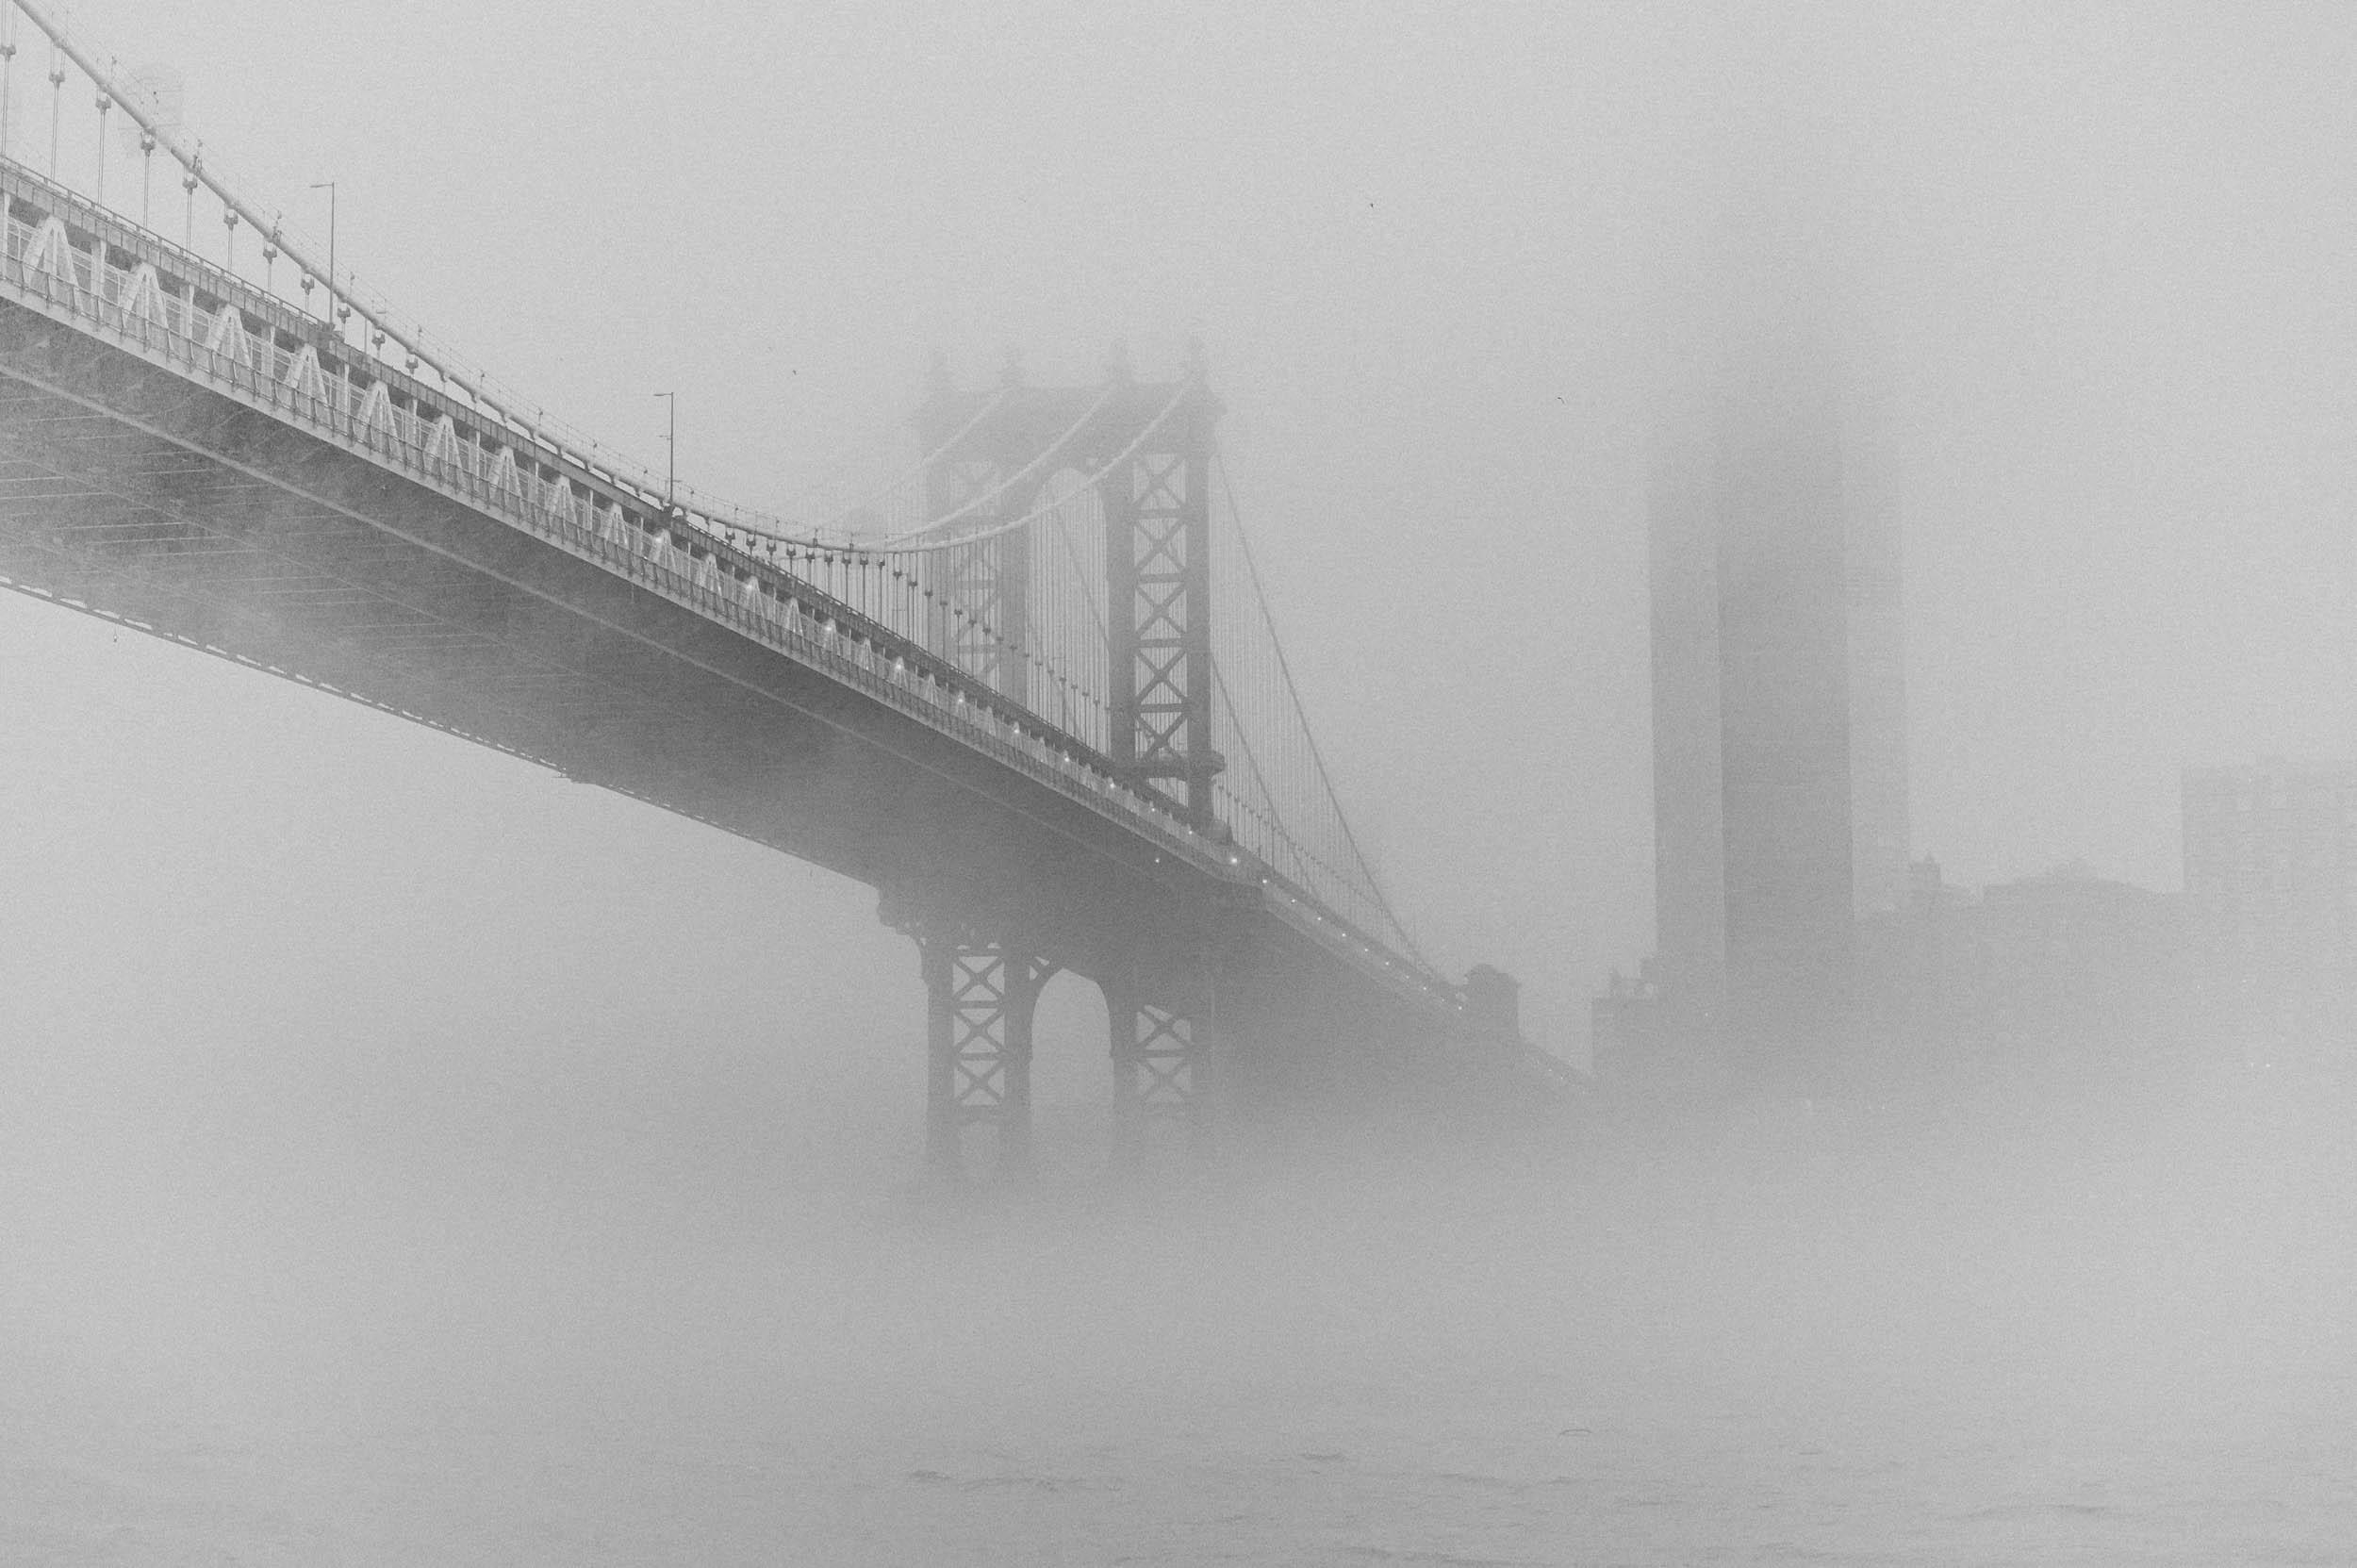 NYC-LoRes-33.jpg